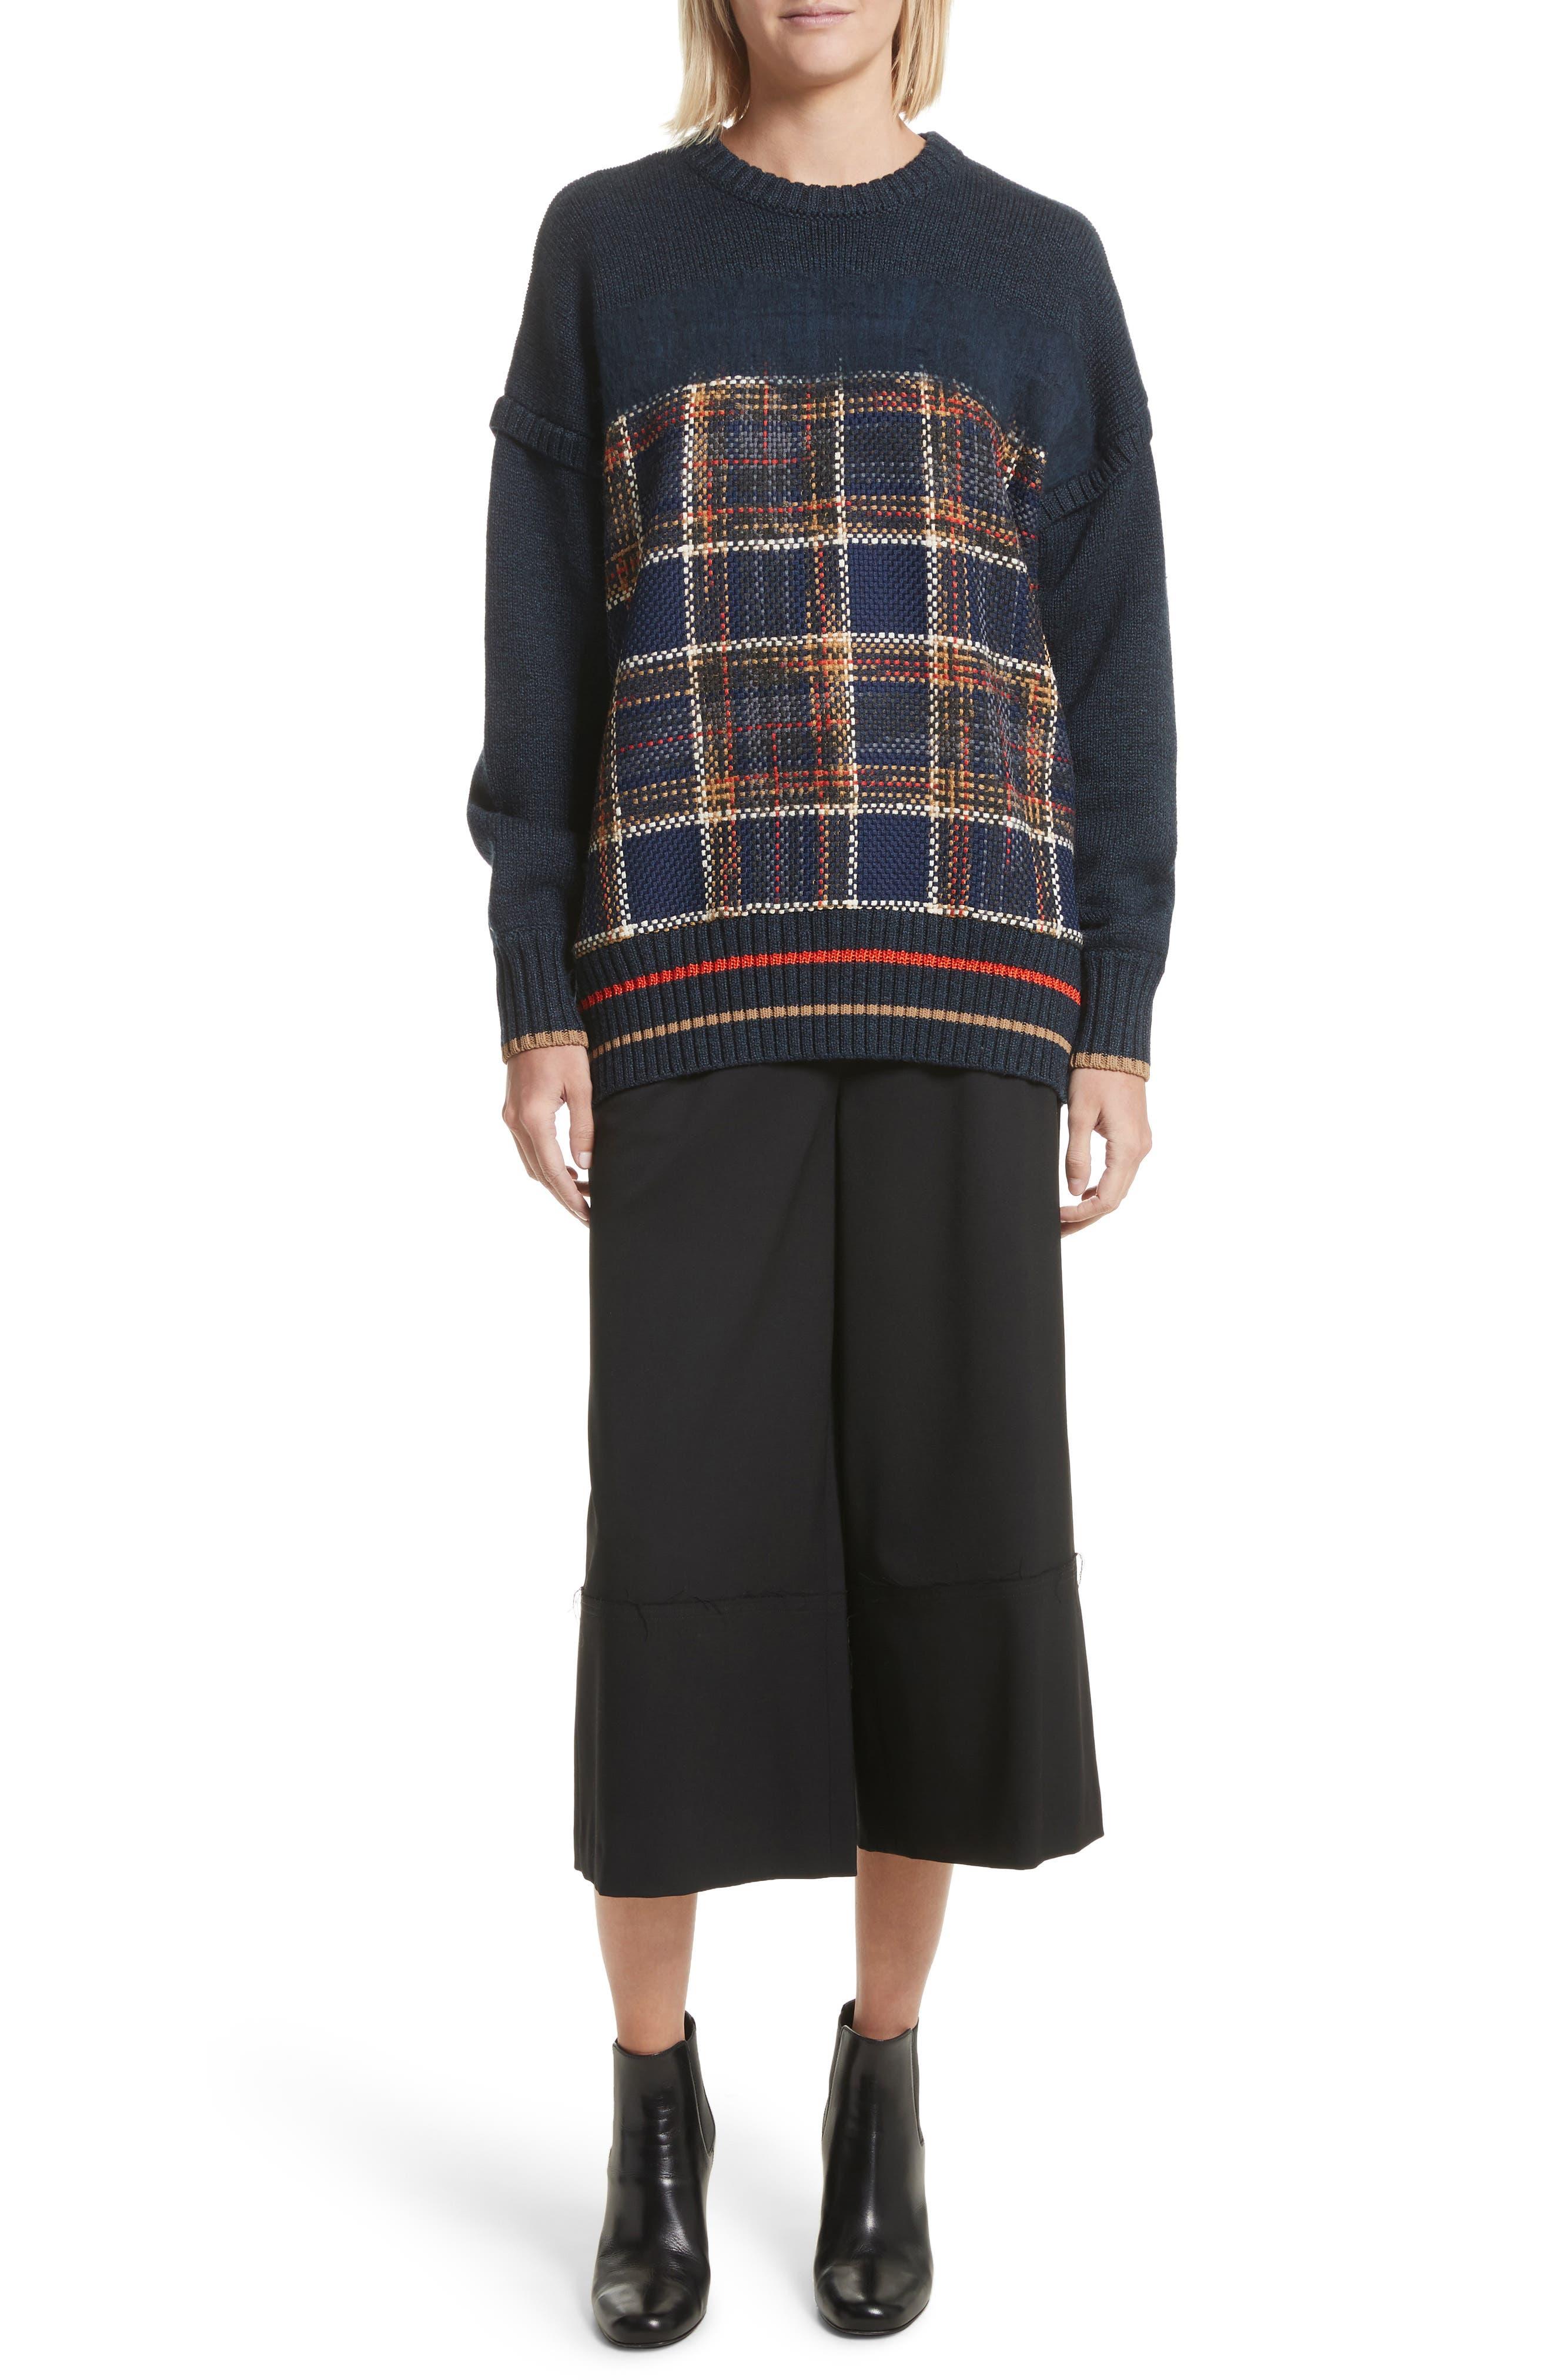 GREY Jason Wu Oversize Sweatshirt